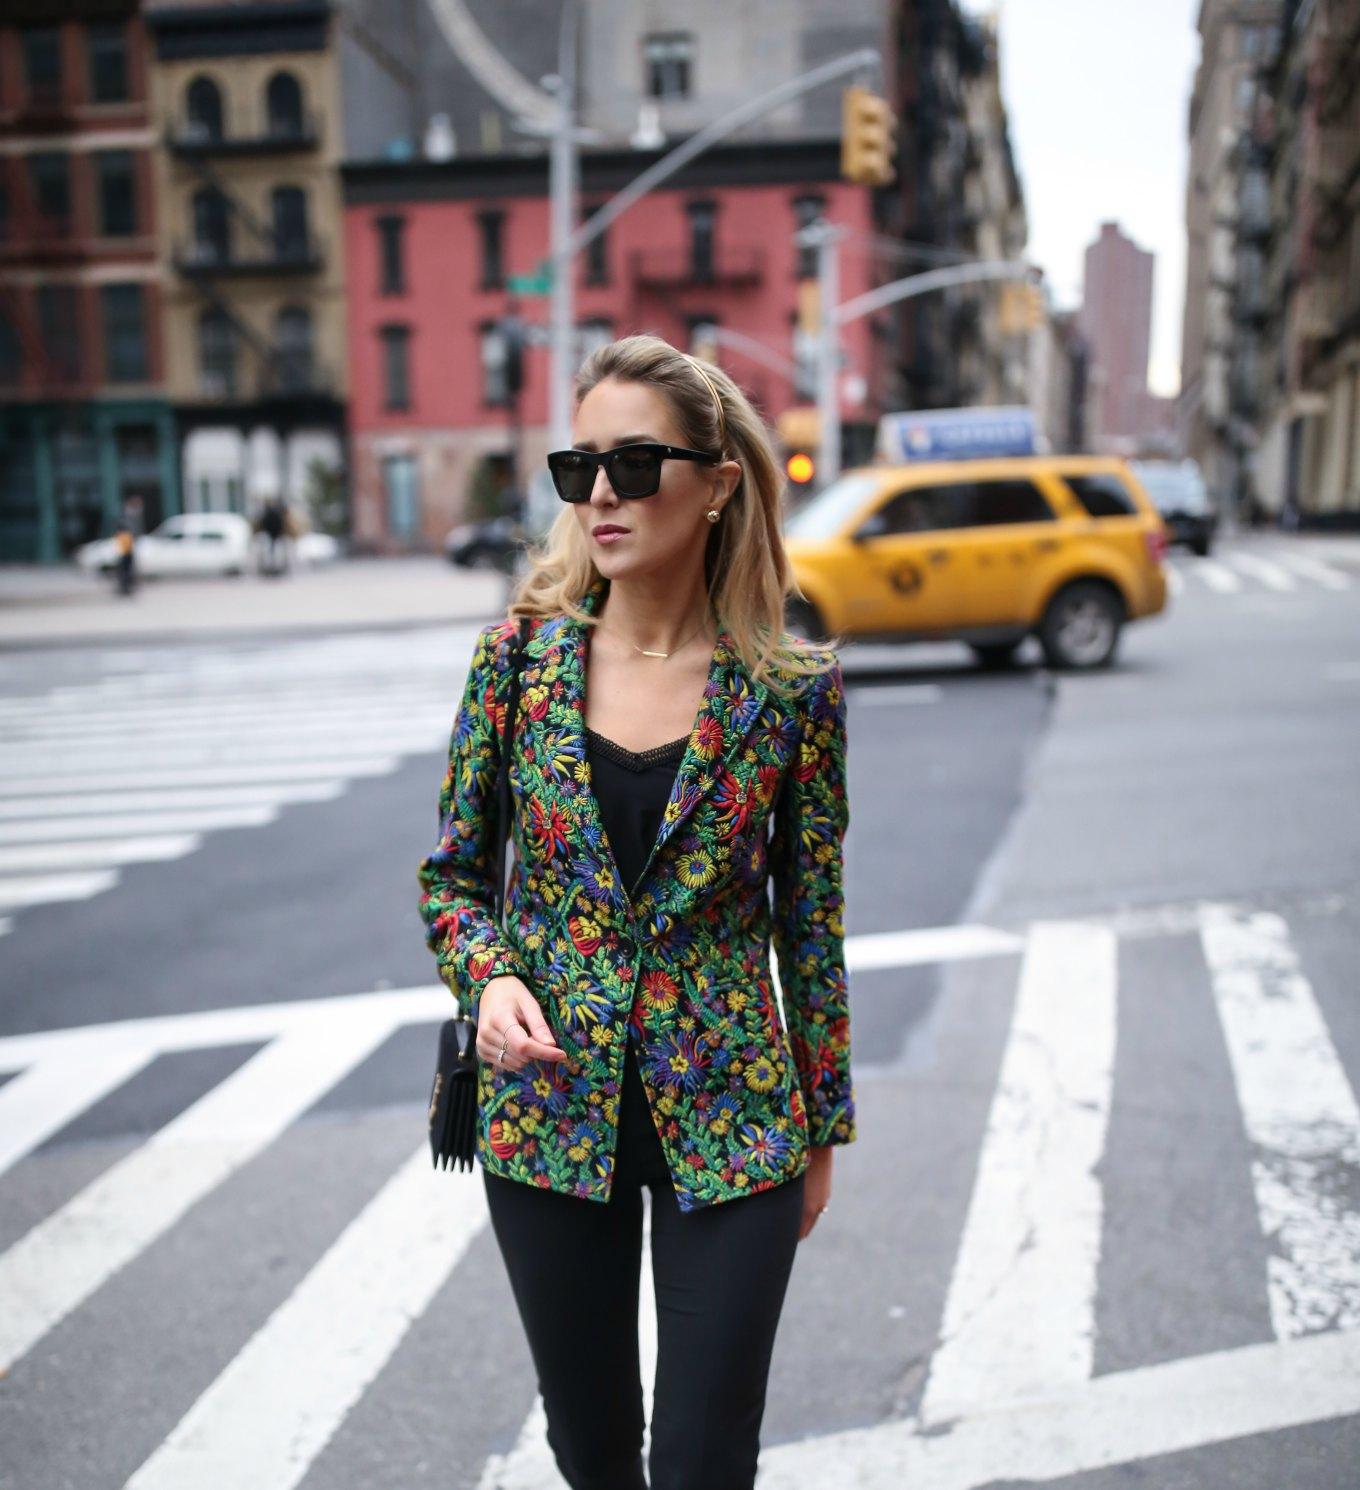 Phillip-lim-floral-jacquard-blazer-spring趋势 - 工作服 - 磨损办公室 - 经典 - 专业风格 - 博客4